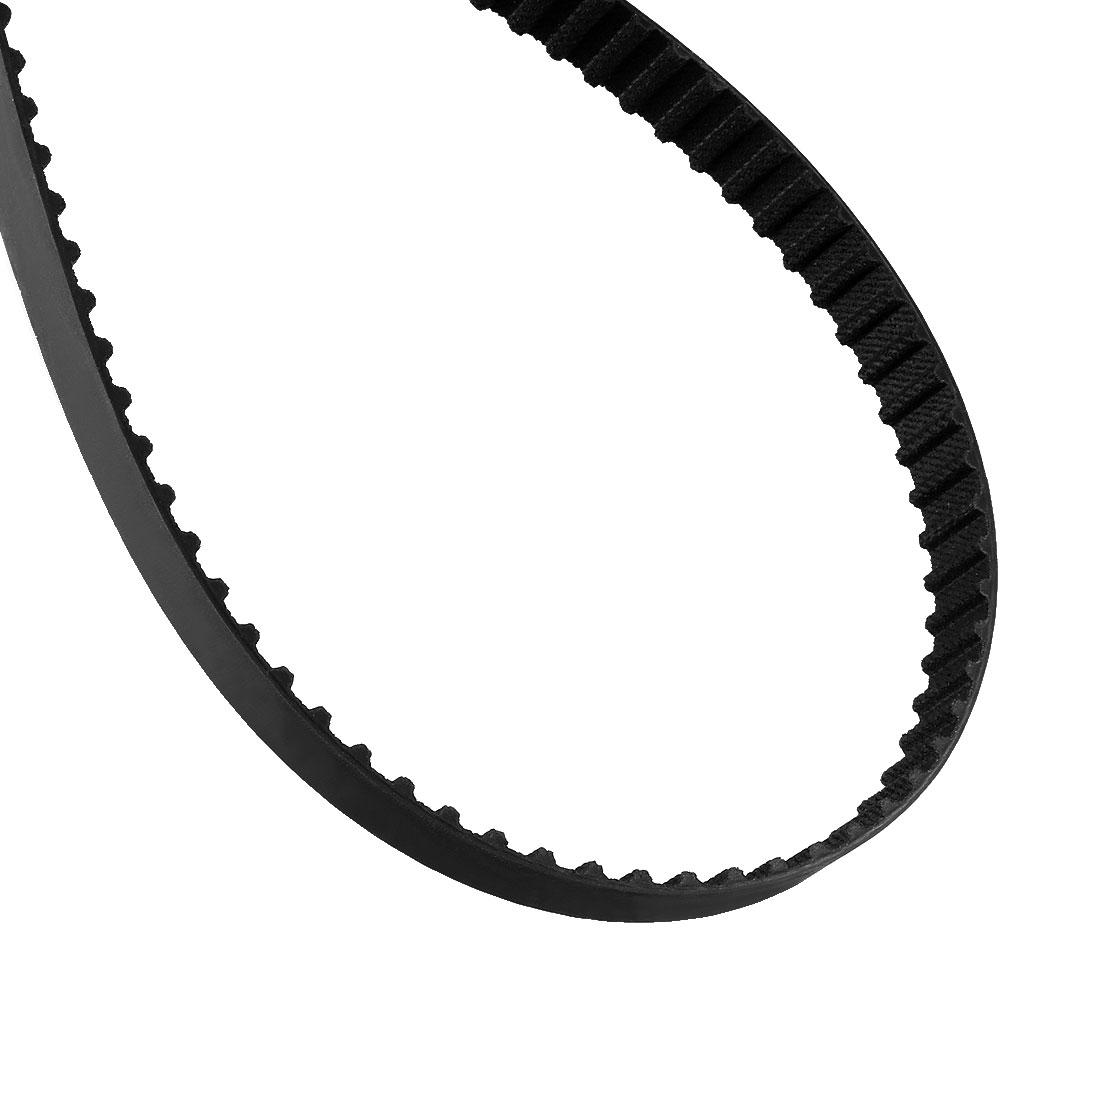 310XL 155 Teeth 10mm Width 5.08mm Pitch Stepper Motor Rubber Timing Belt Black